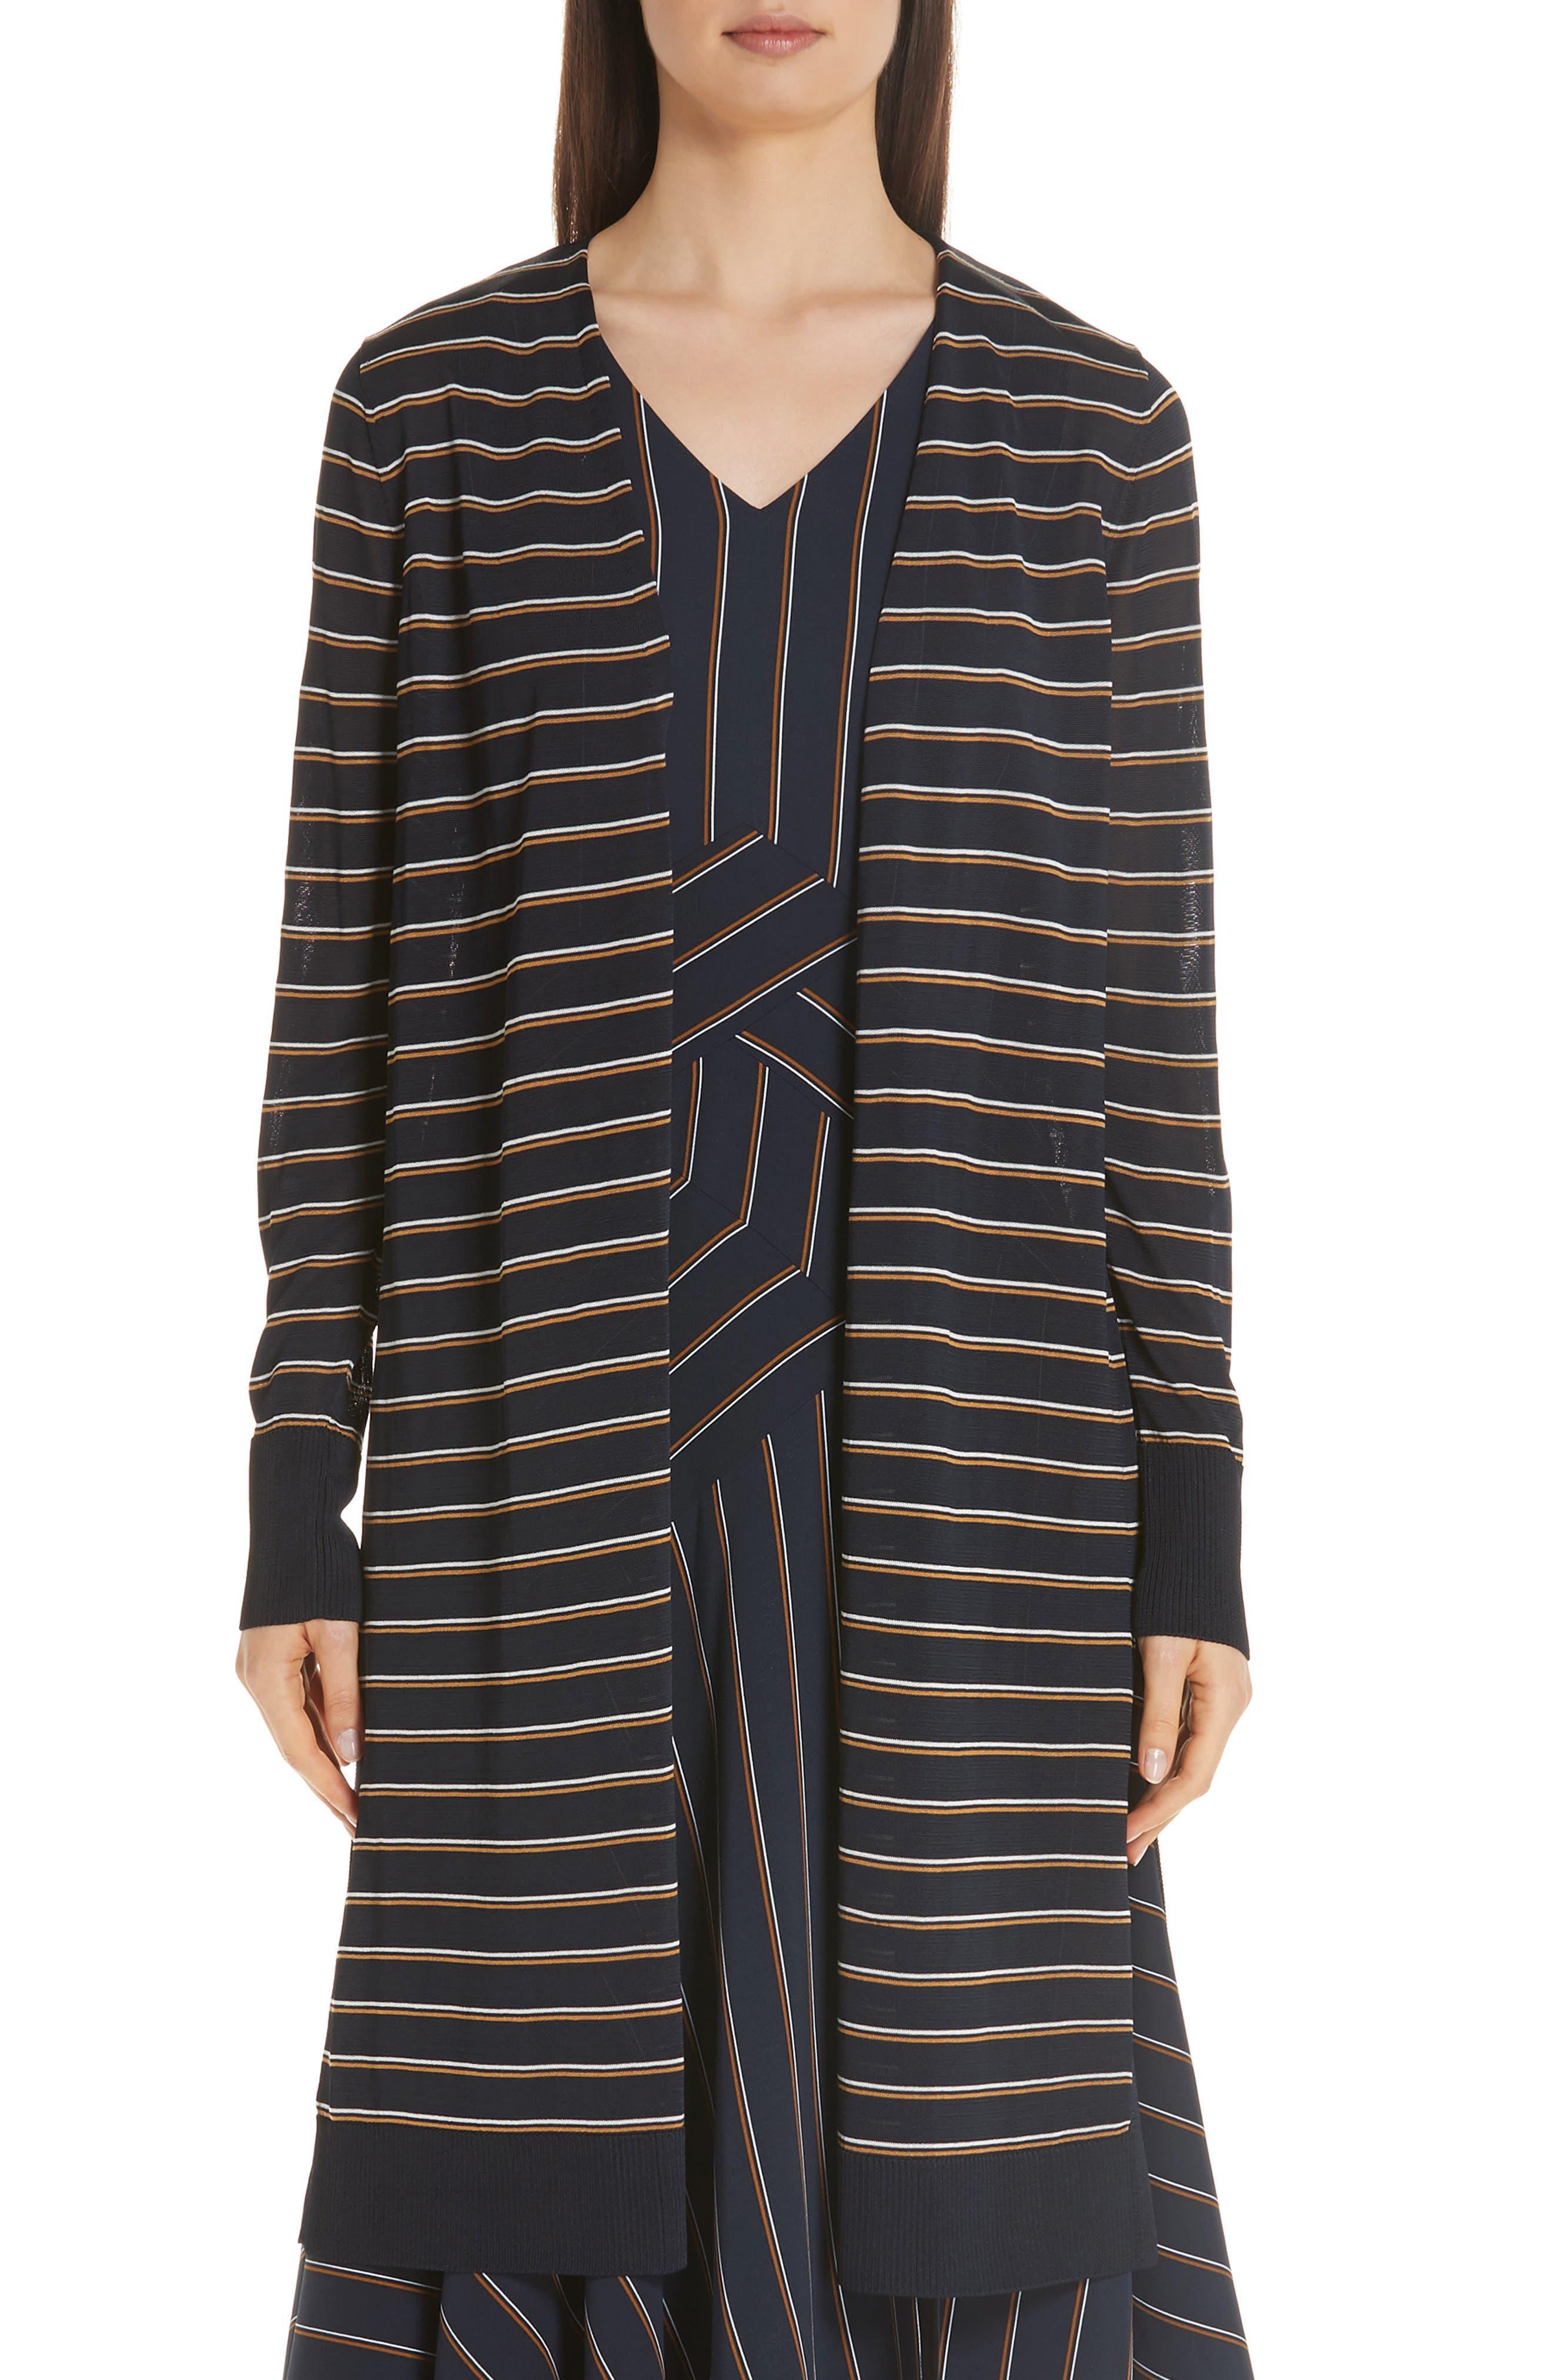 Metropolitan Shine Striped Long Cardigan in Ink Multi